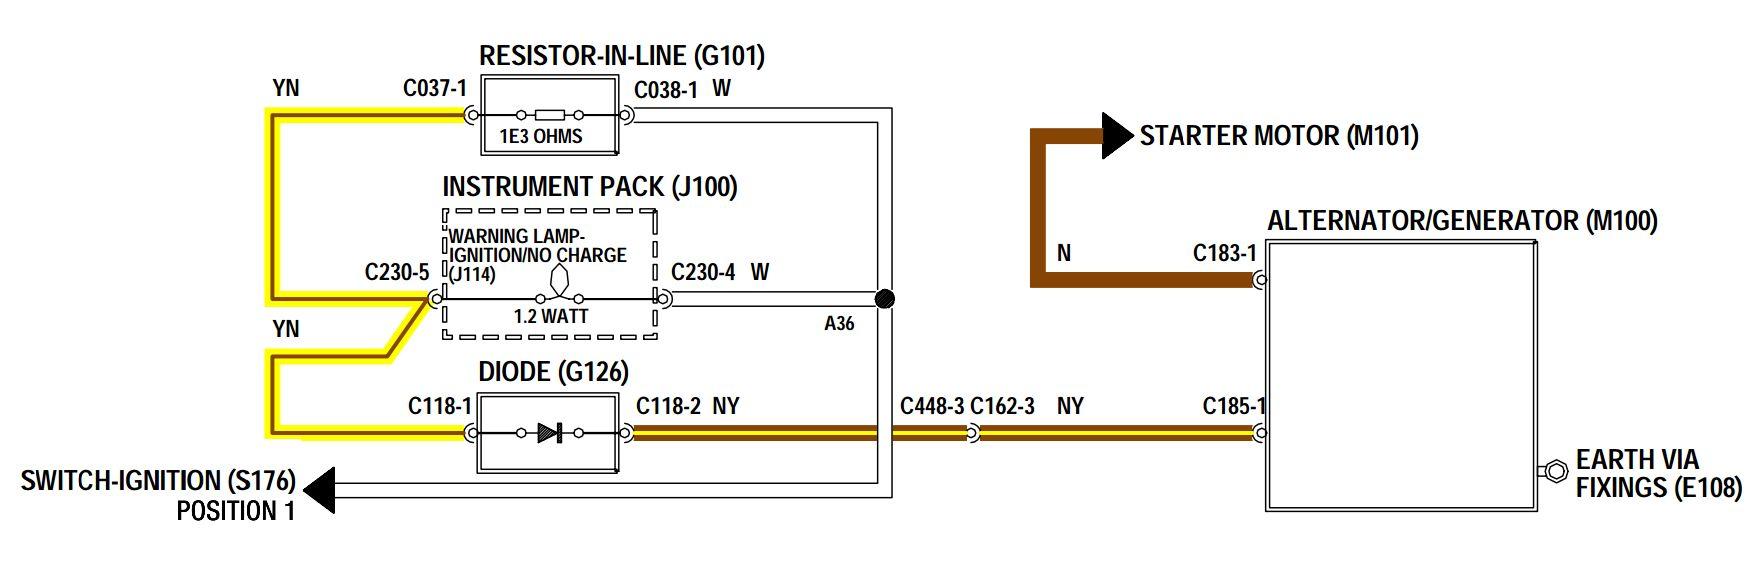 DEFENDER2 NET - View topic - Alternator exciter wire